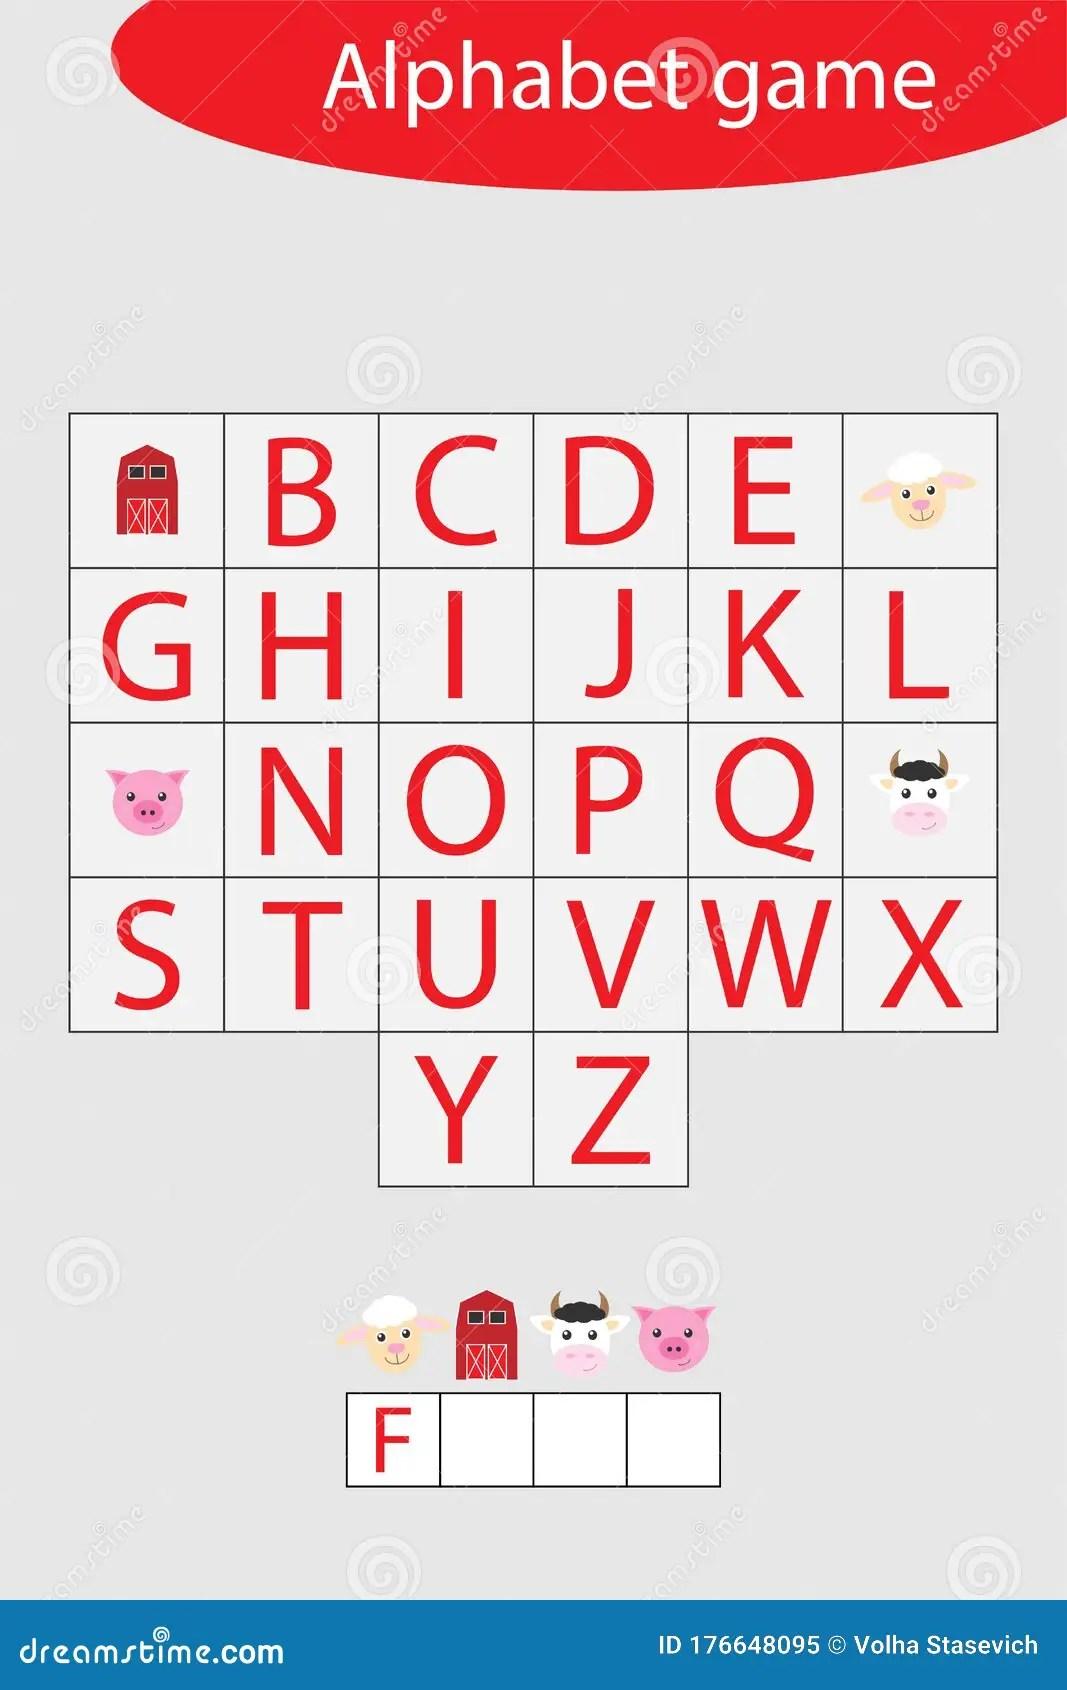 Farm Alphabet Game For Children Make A Word Preschool